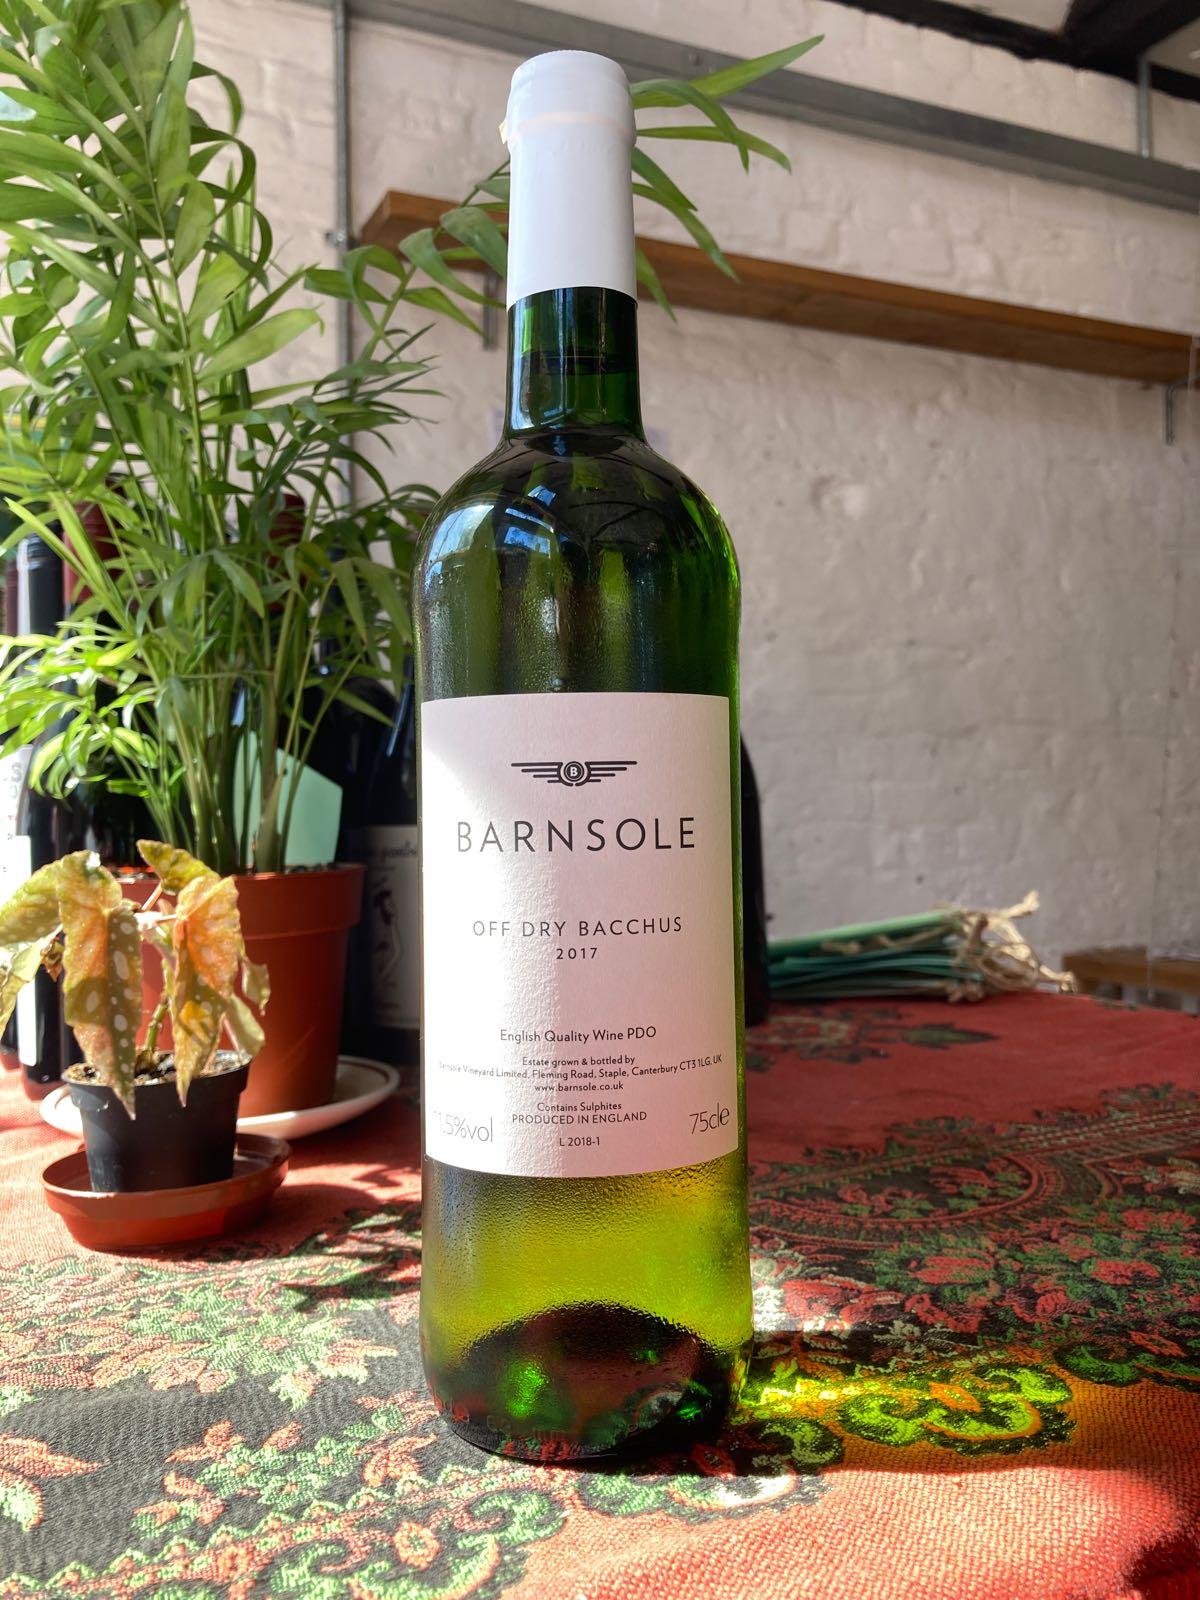 Barnsole - Off Dry Bacchus (11.5%) (Staple, nr Canterbury)